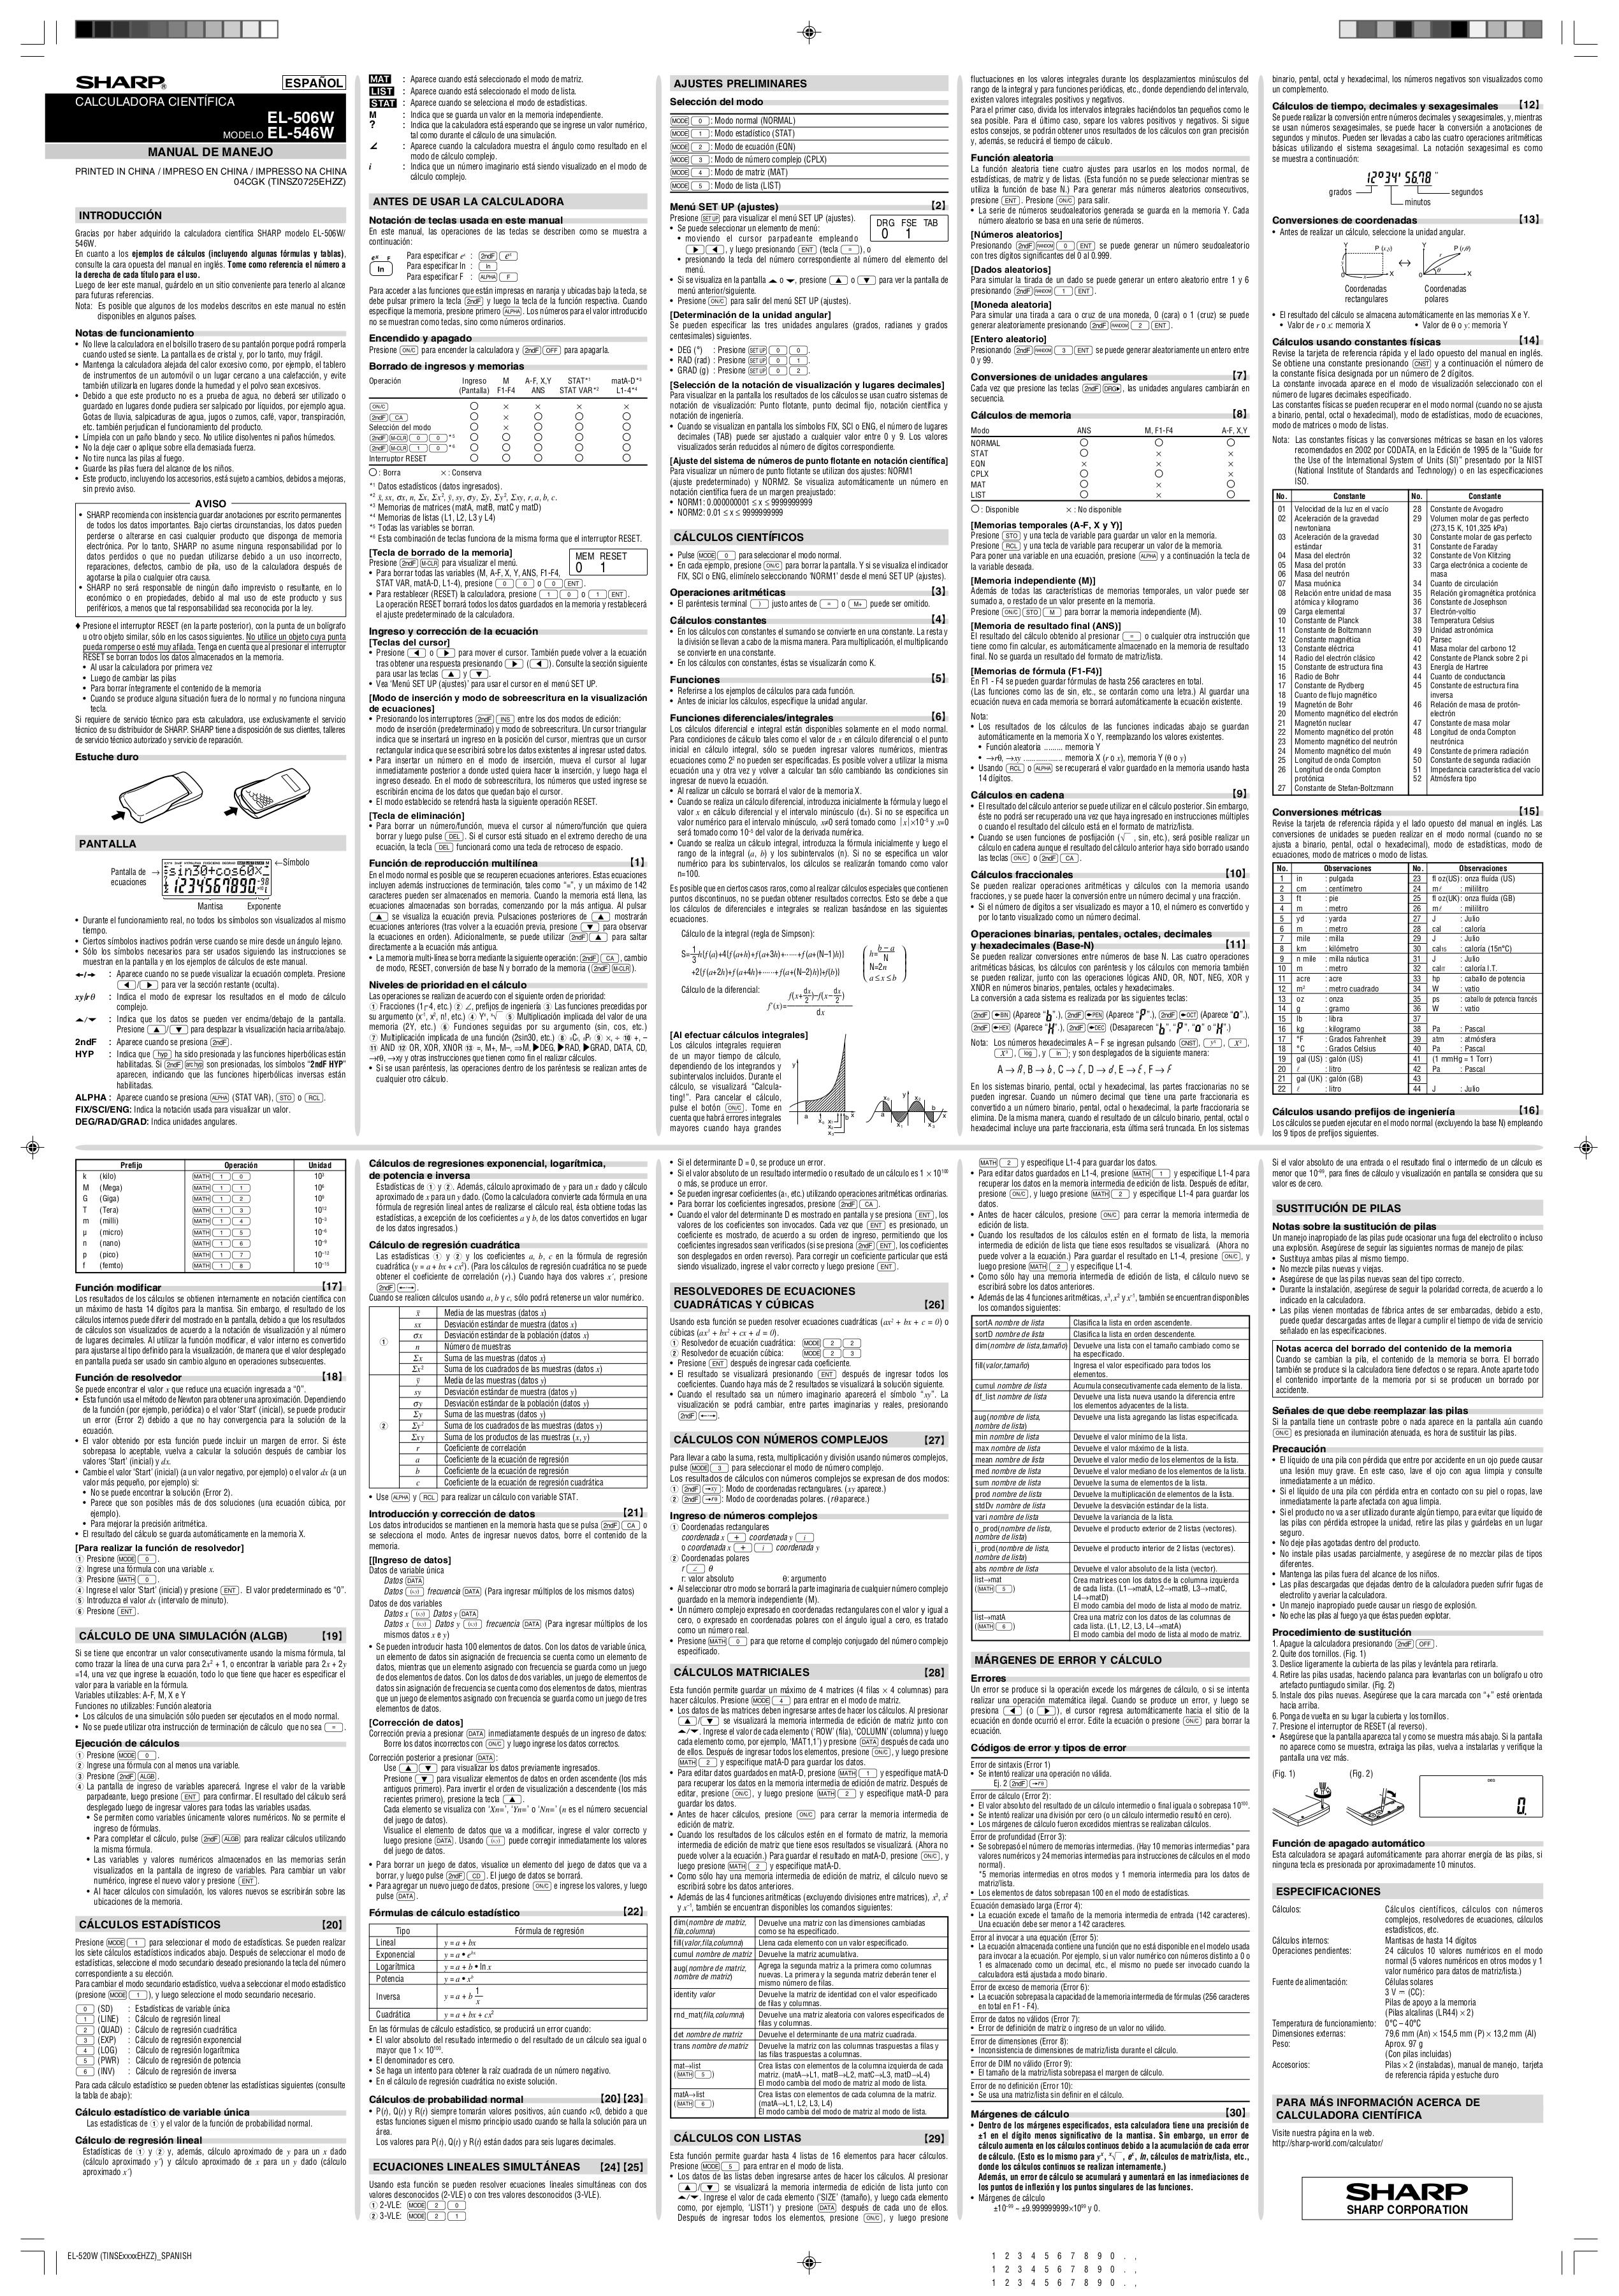 download free pdf for sharp el 546w calculator manual rh umlib com sharp financial calculator user manual sharp el 520w calculator instruction manual